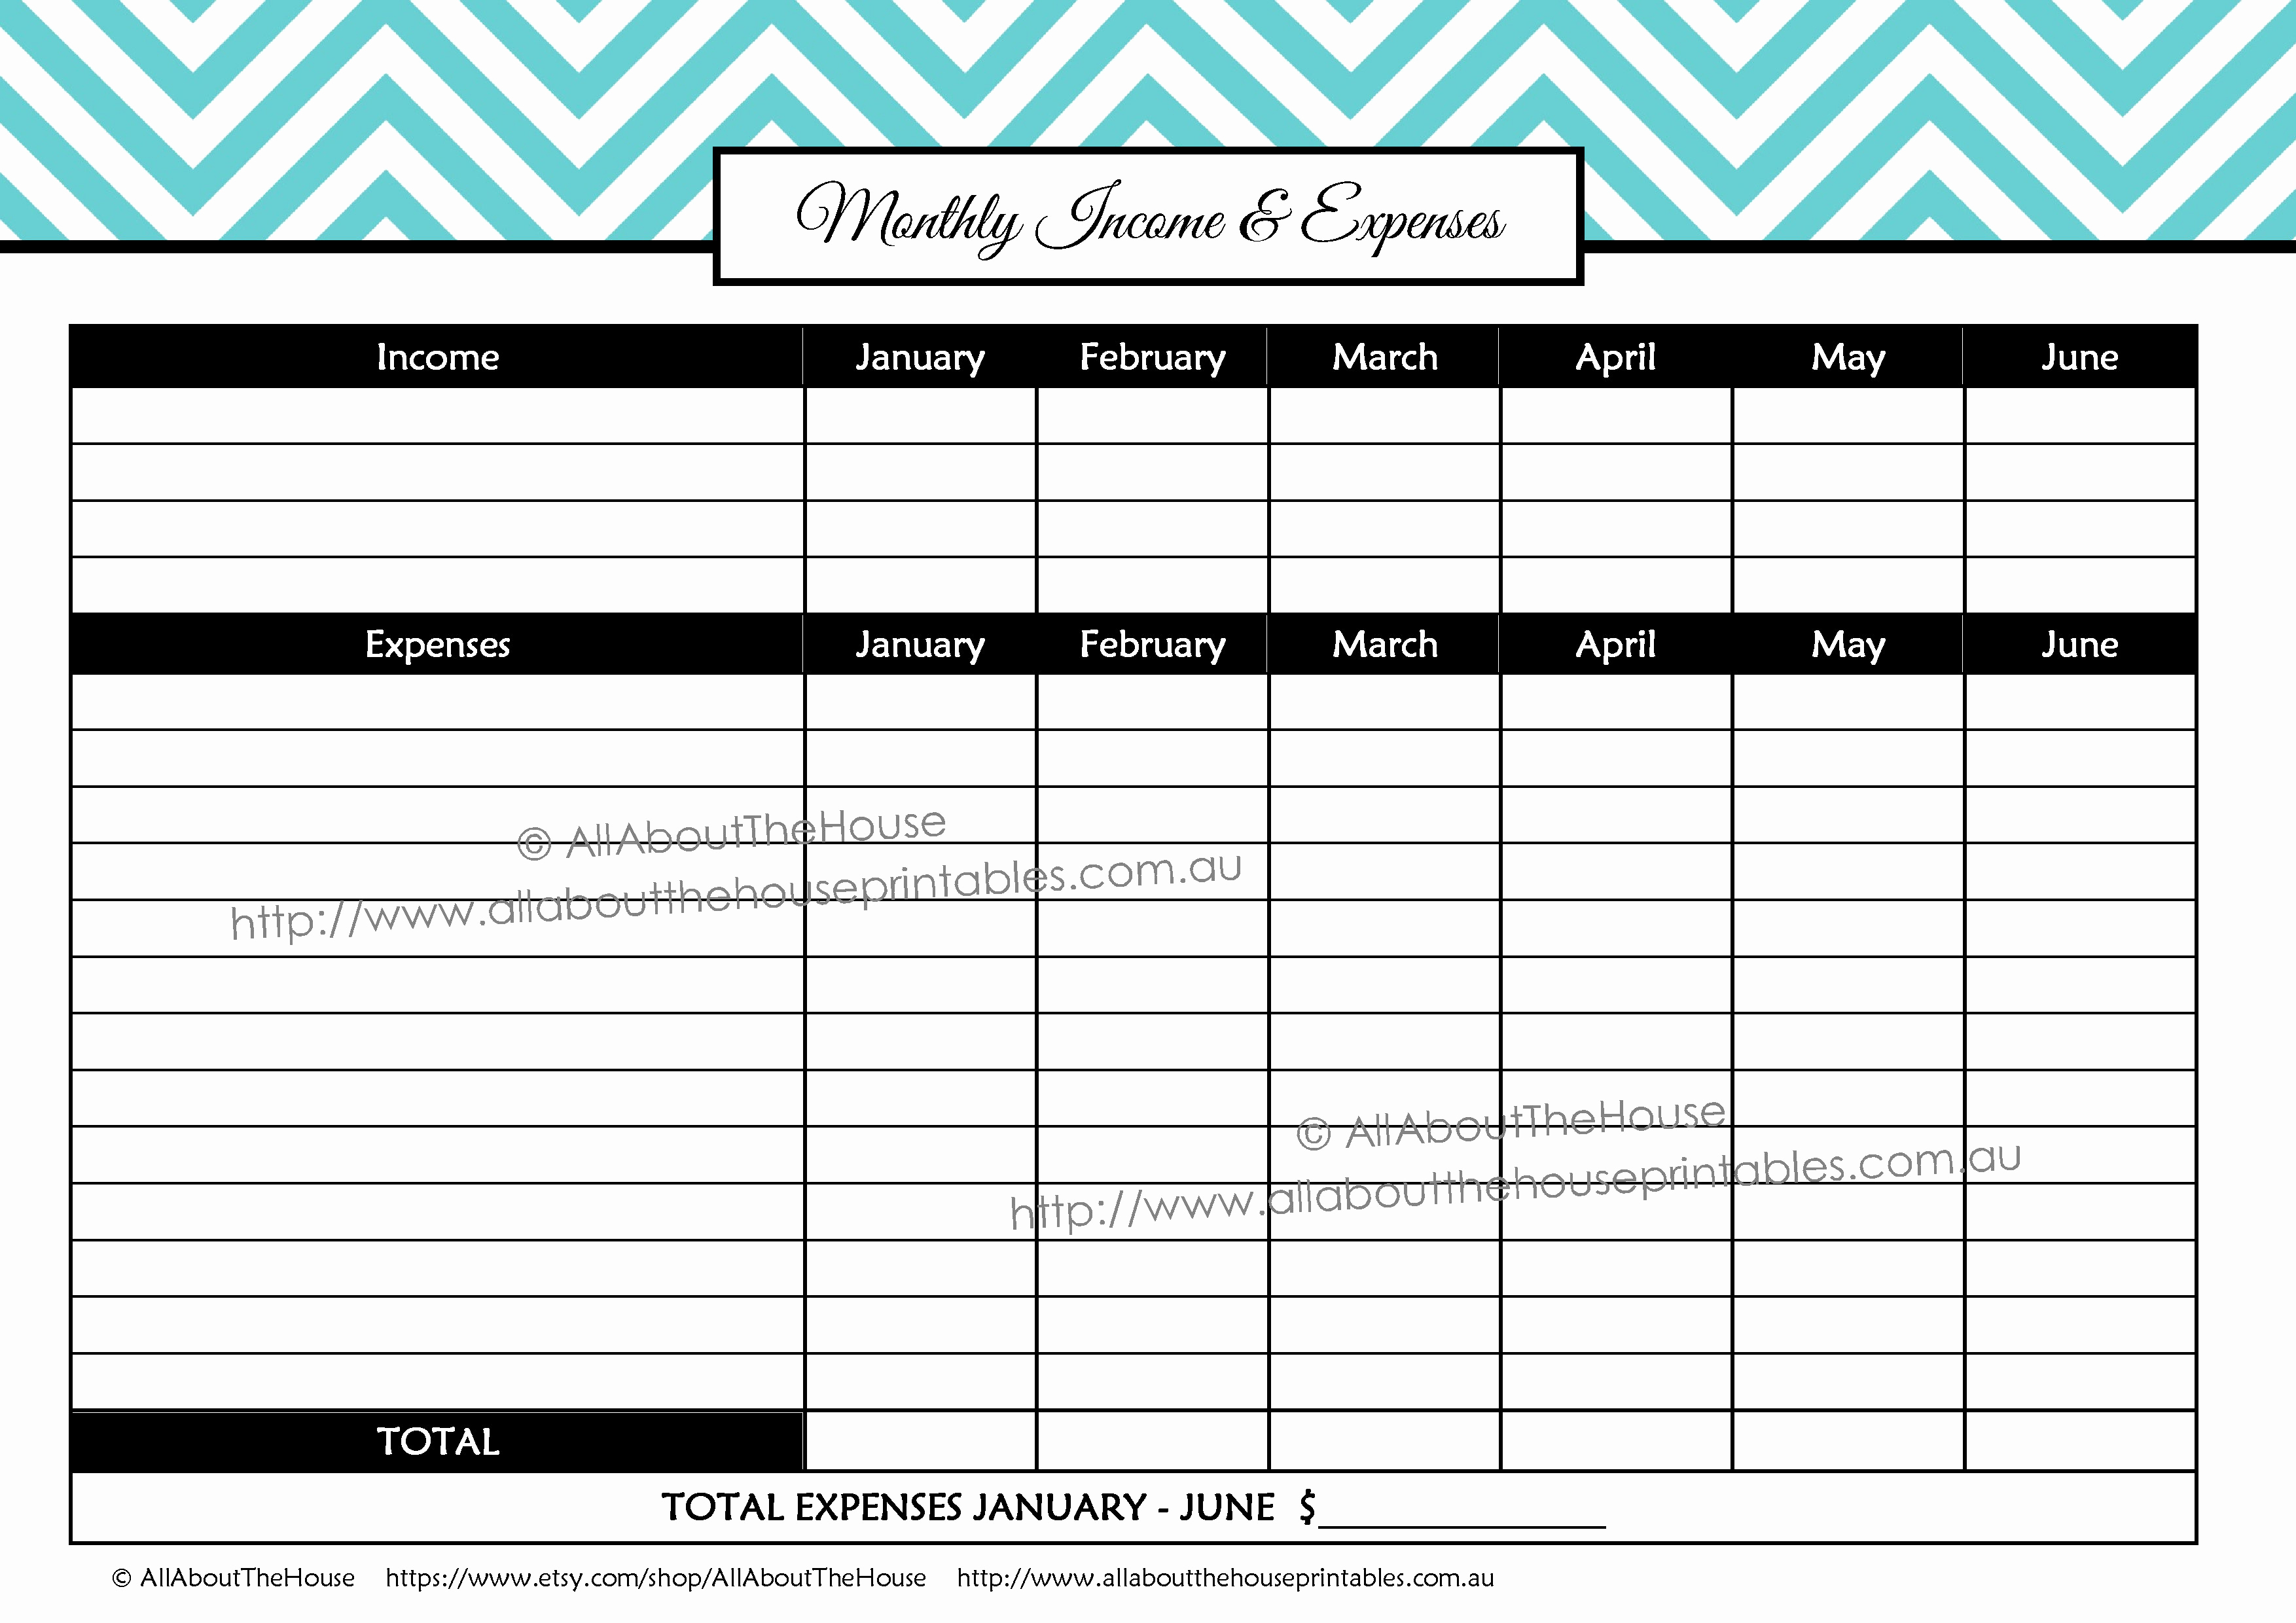 Retirement Budget Planner Spreadsheet Inside Sheetirement Budget Planner Worksheet Transamerica Planning Free